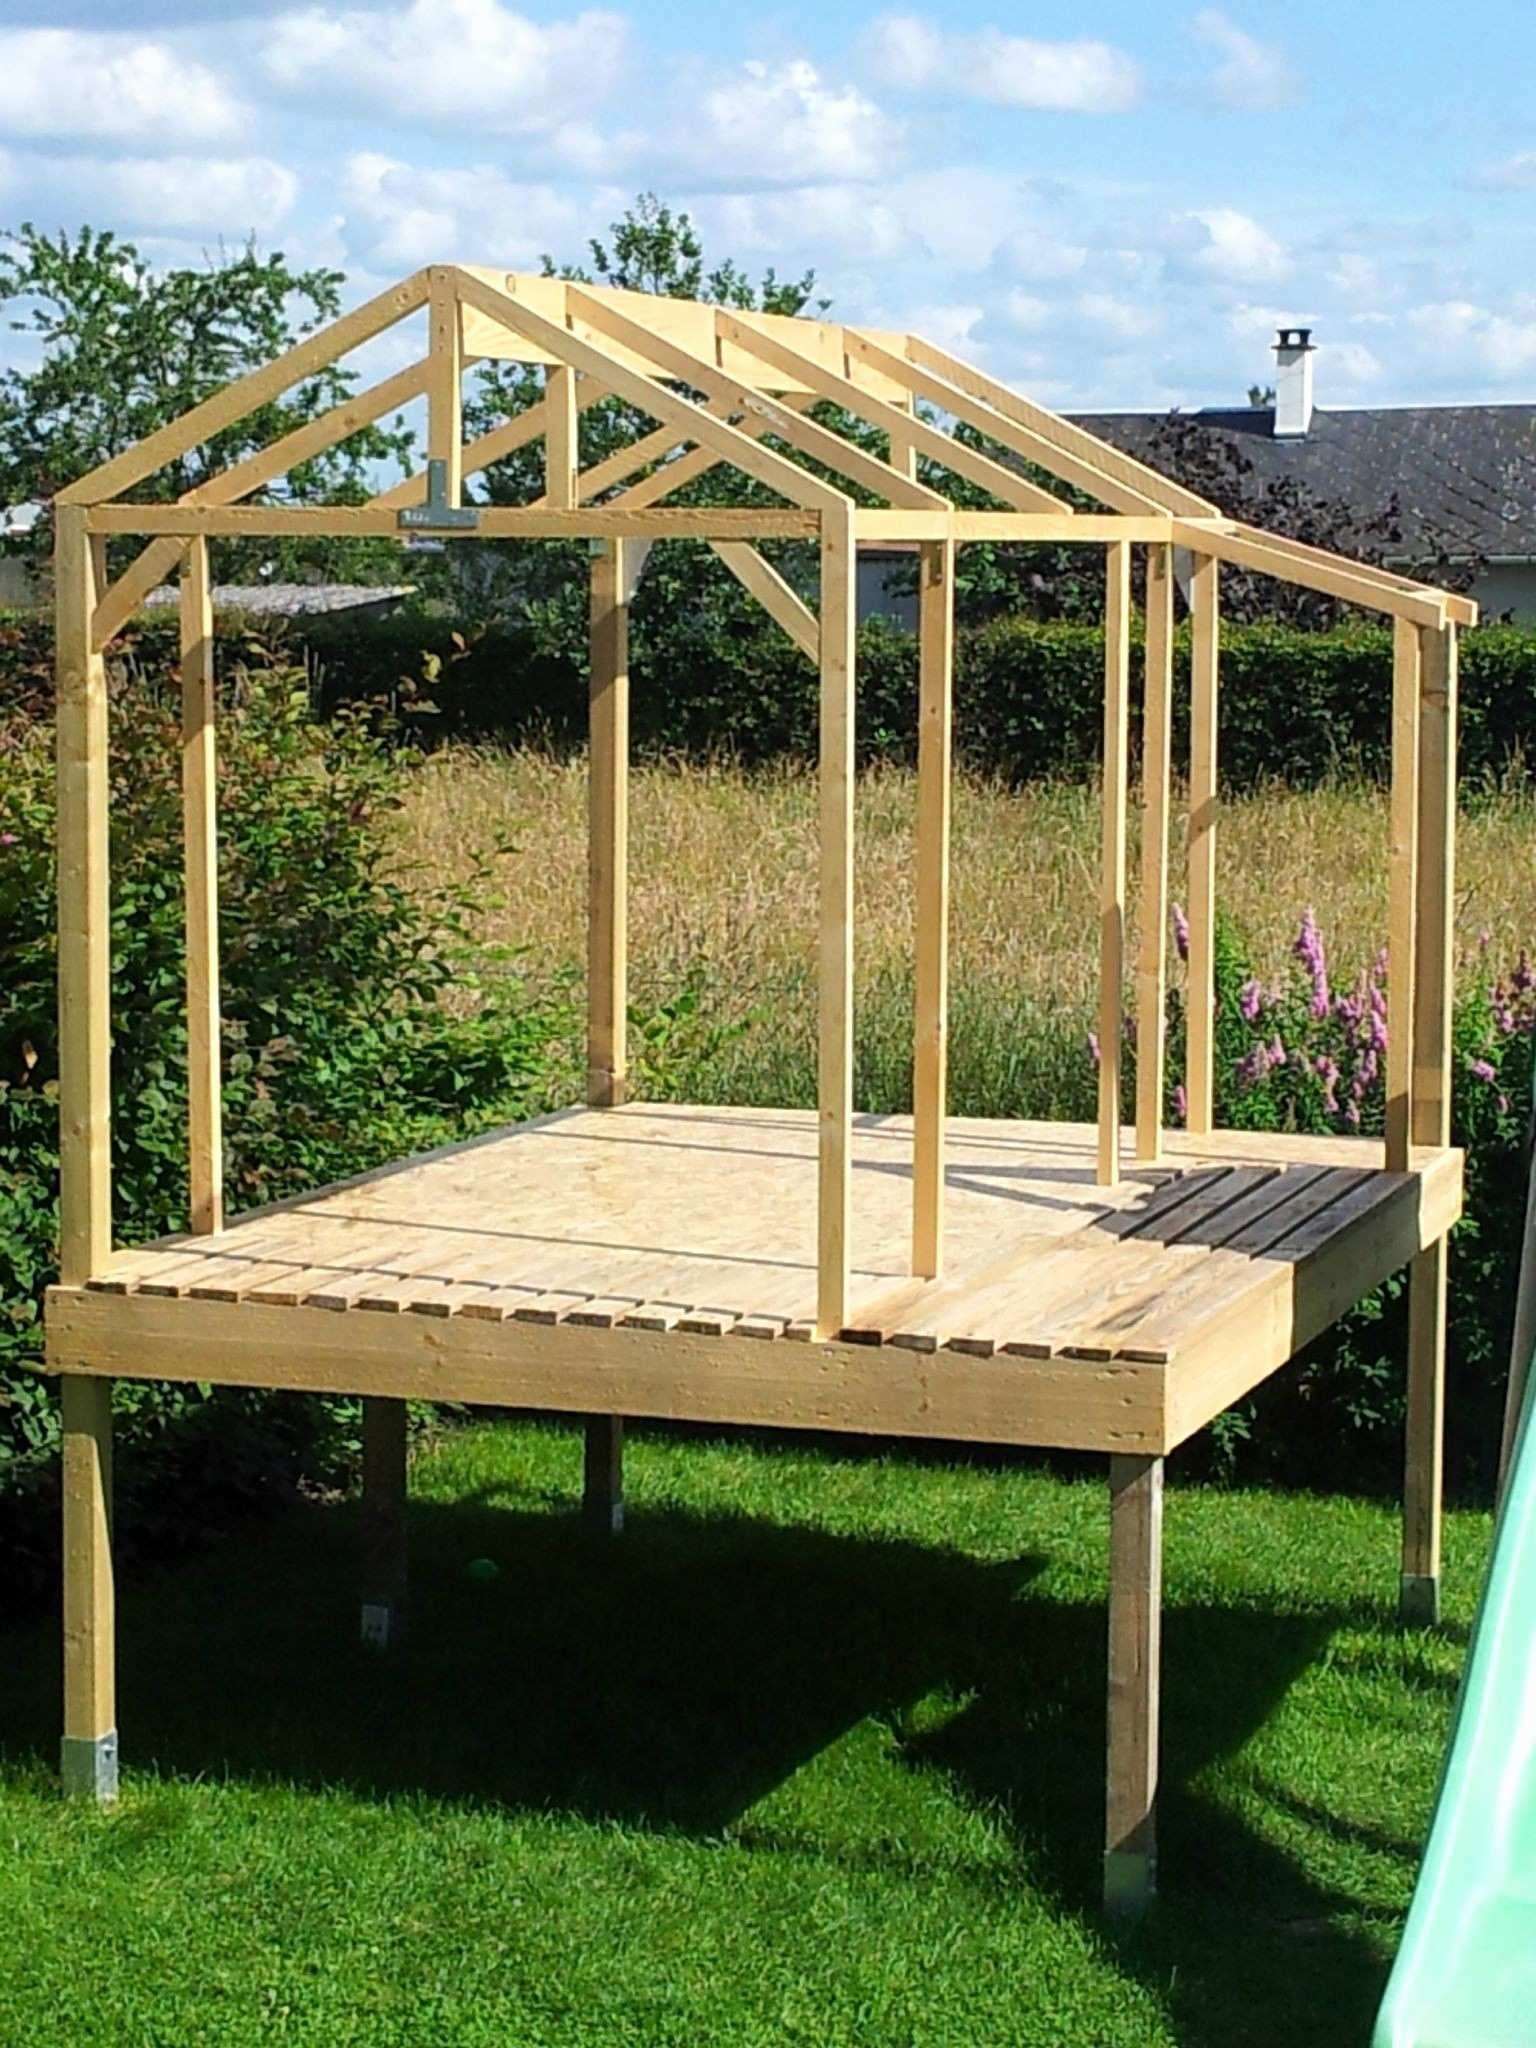 Fabriquer Abri De Jardin En Bois Construire Abri | Своими ... destiné Construction Cabane De Jardin